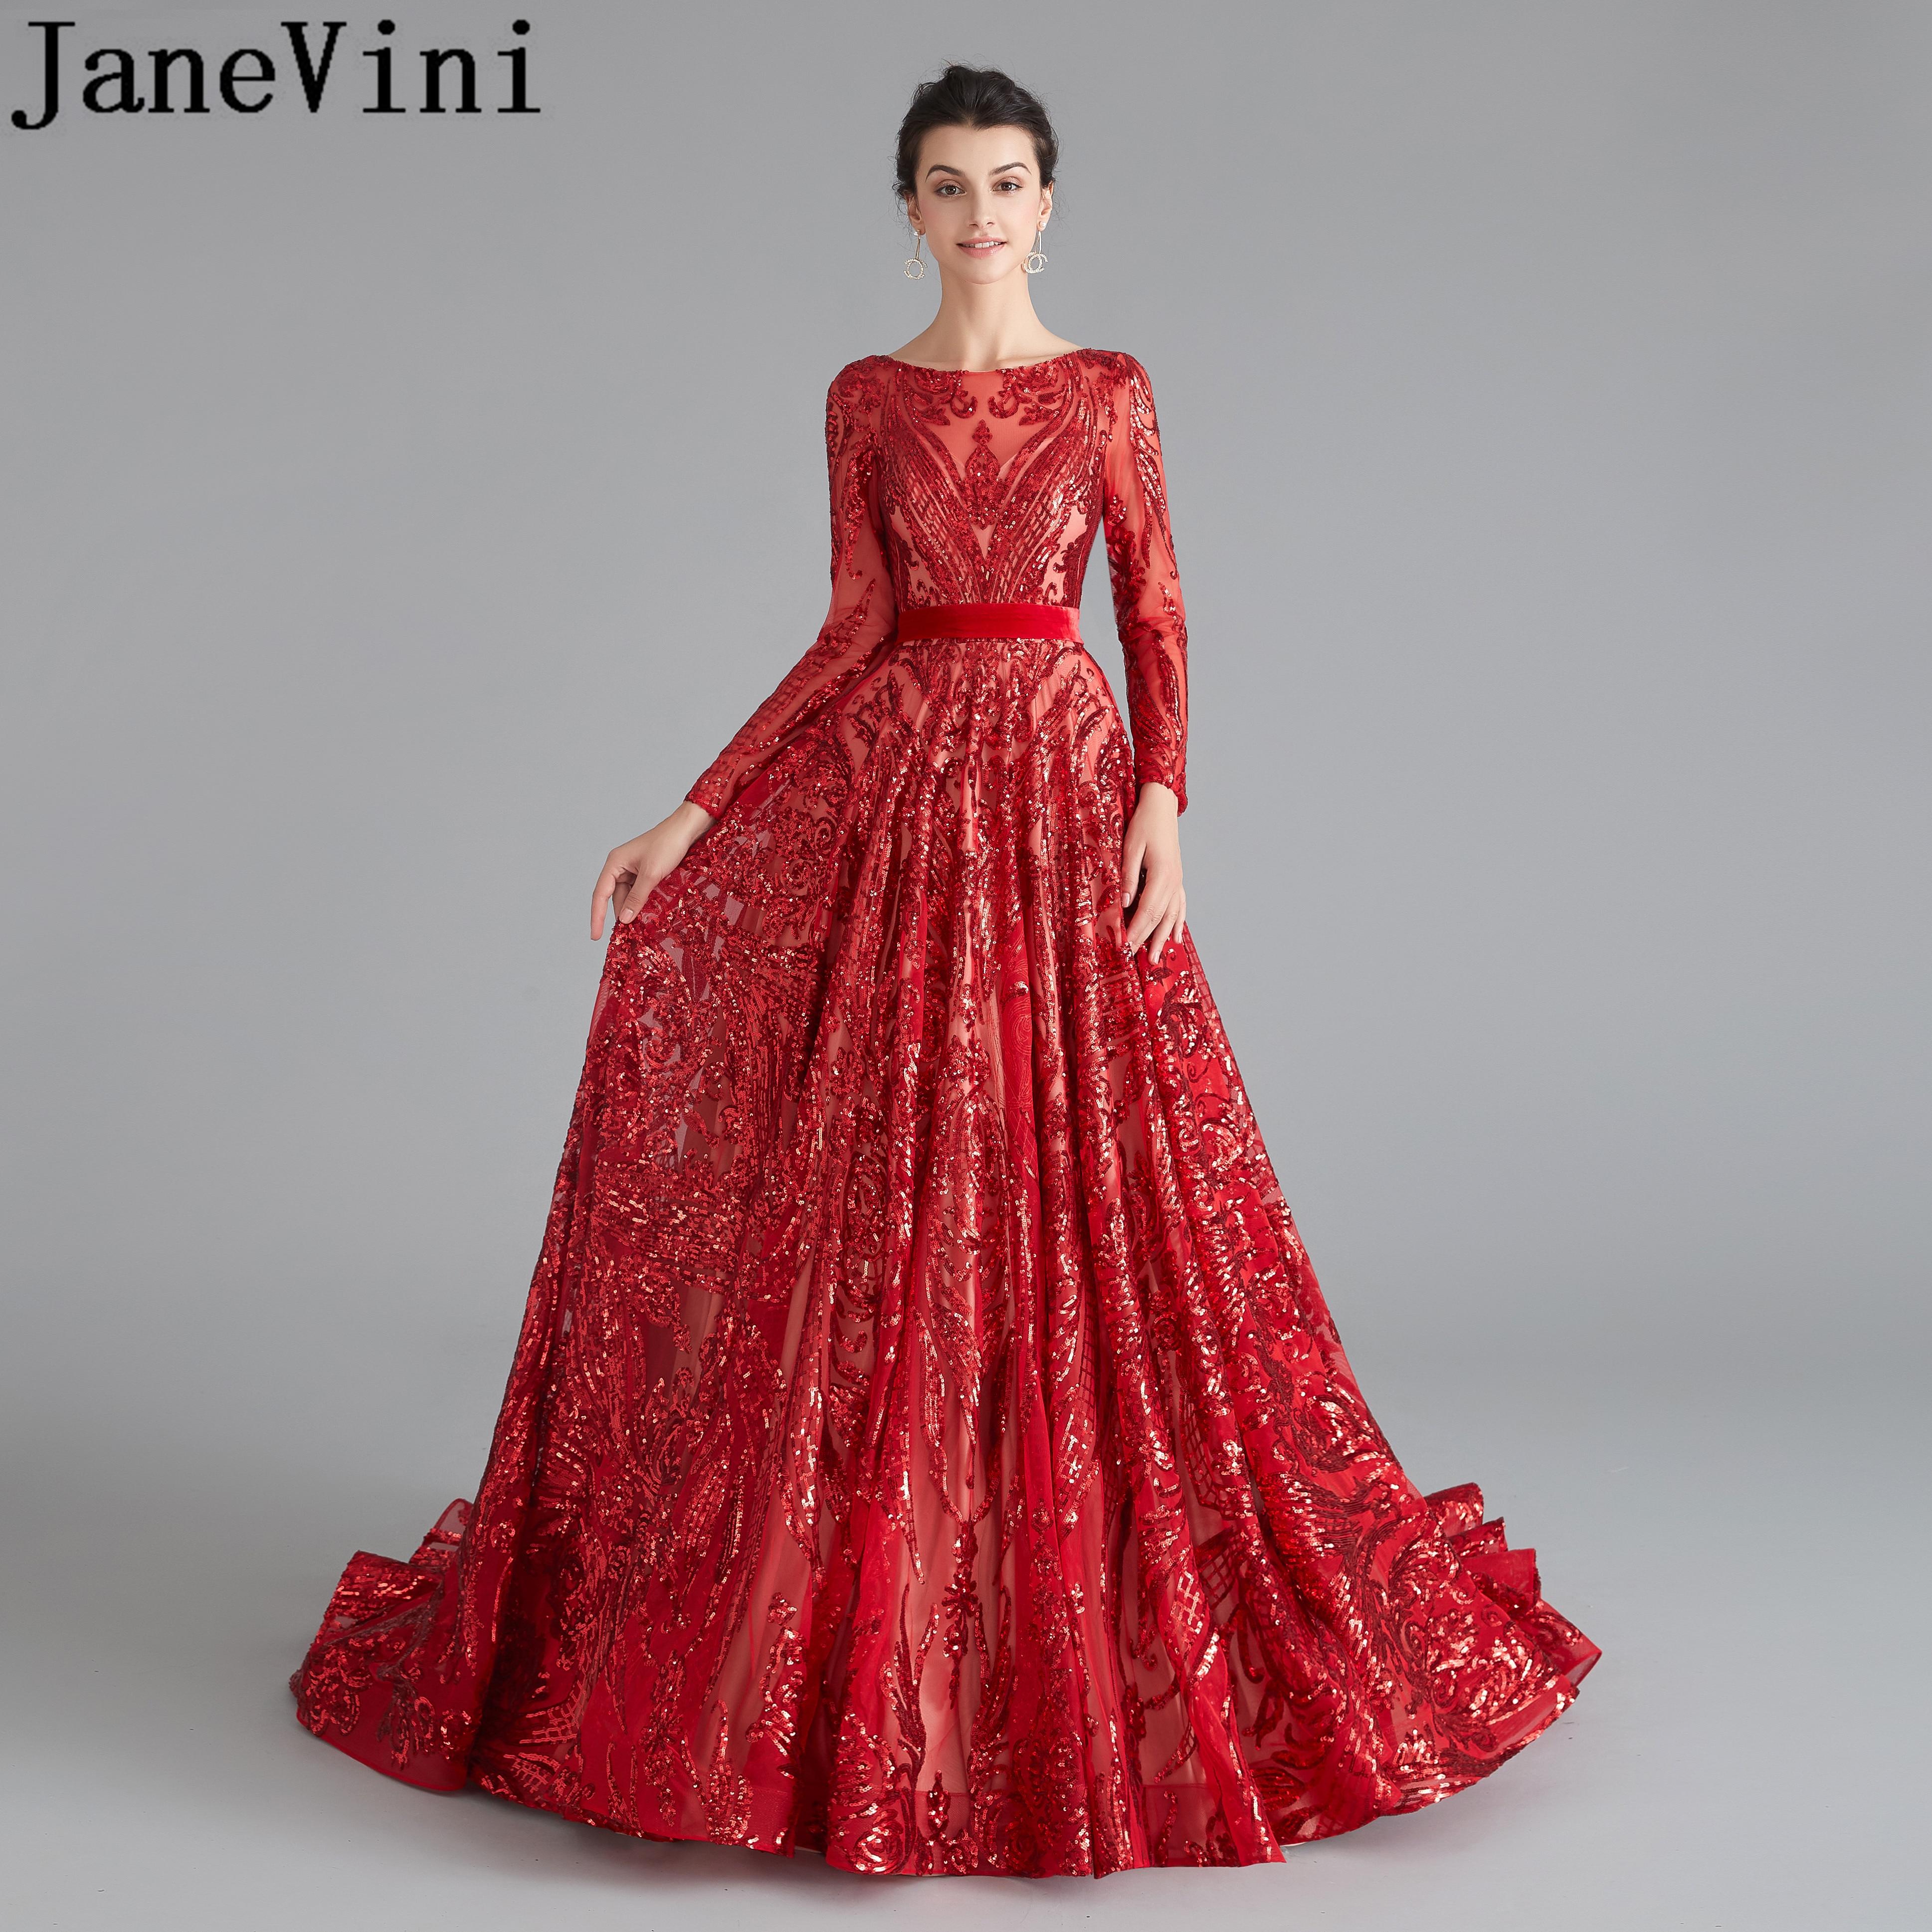 US $20.20 20% OFFJaneVini Arabic Red Evening Prom Dresses 20 Bling  Bling Sequined Gala Party Dress Ballkleider Lang Luxury Open Back Women